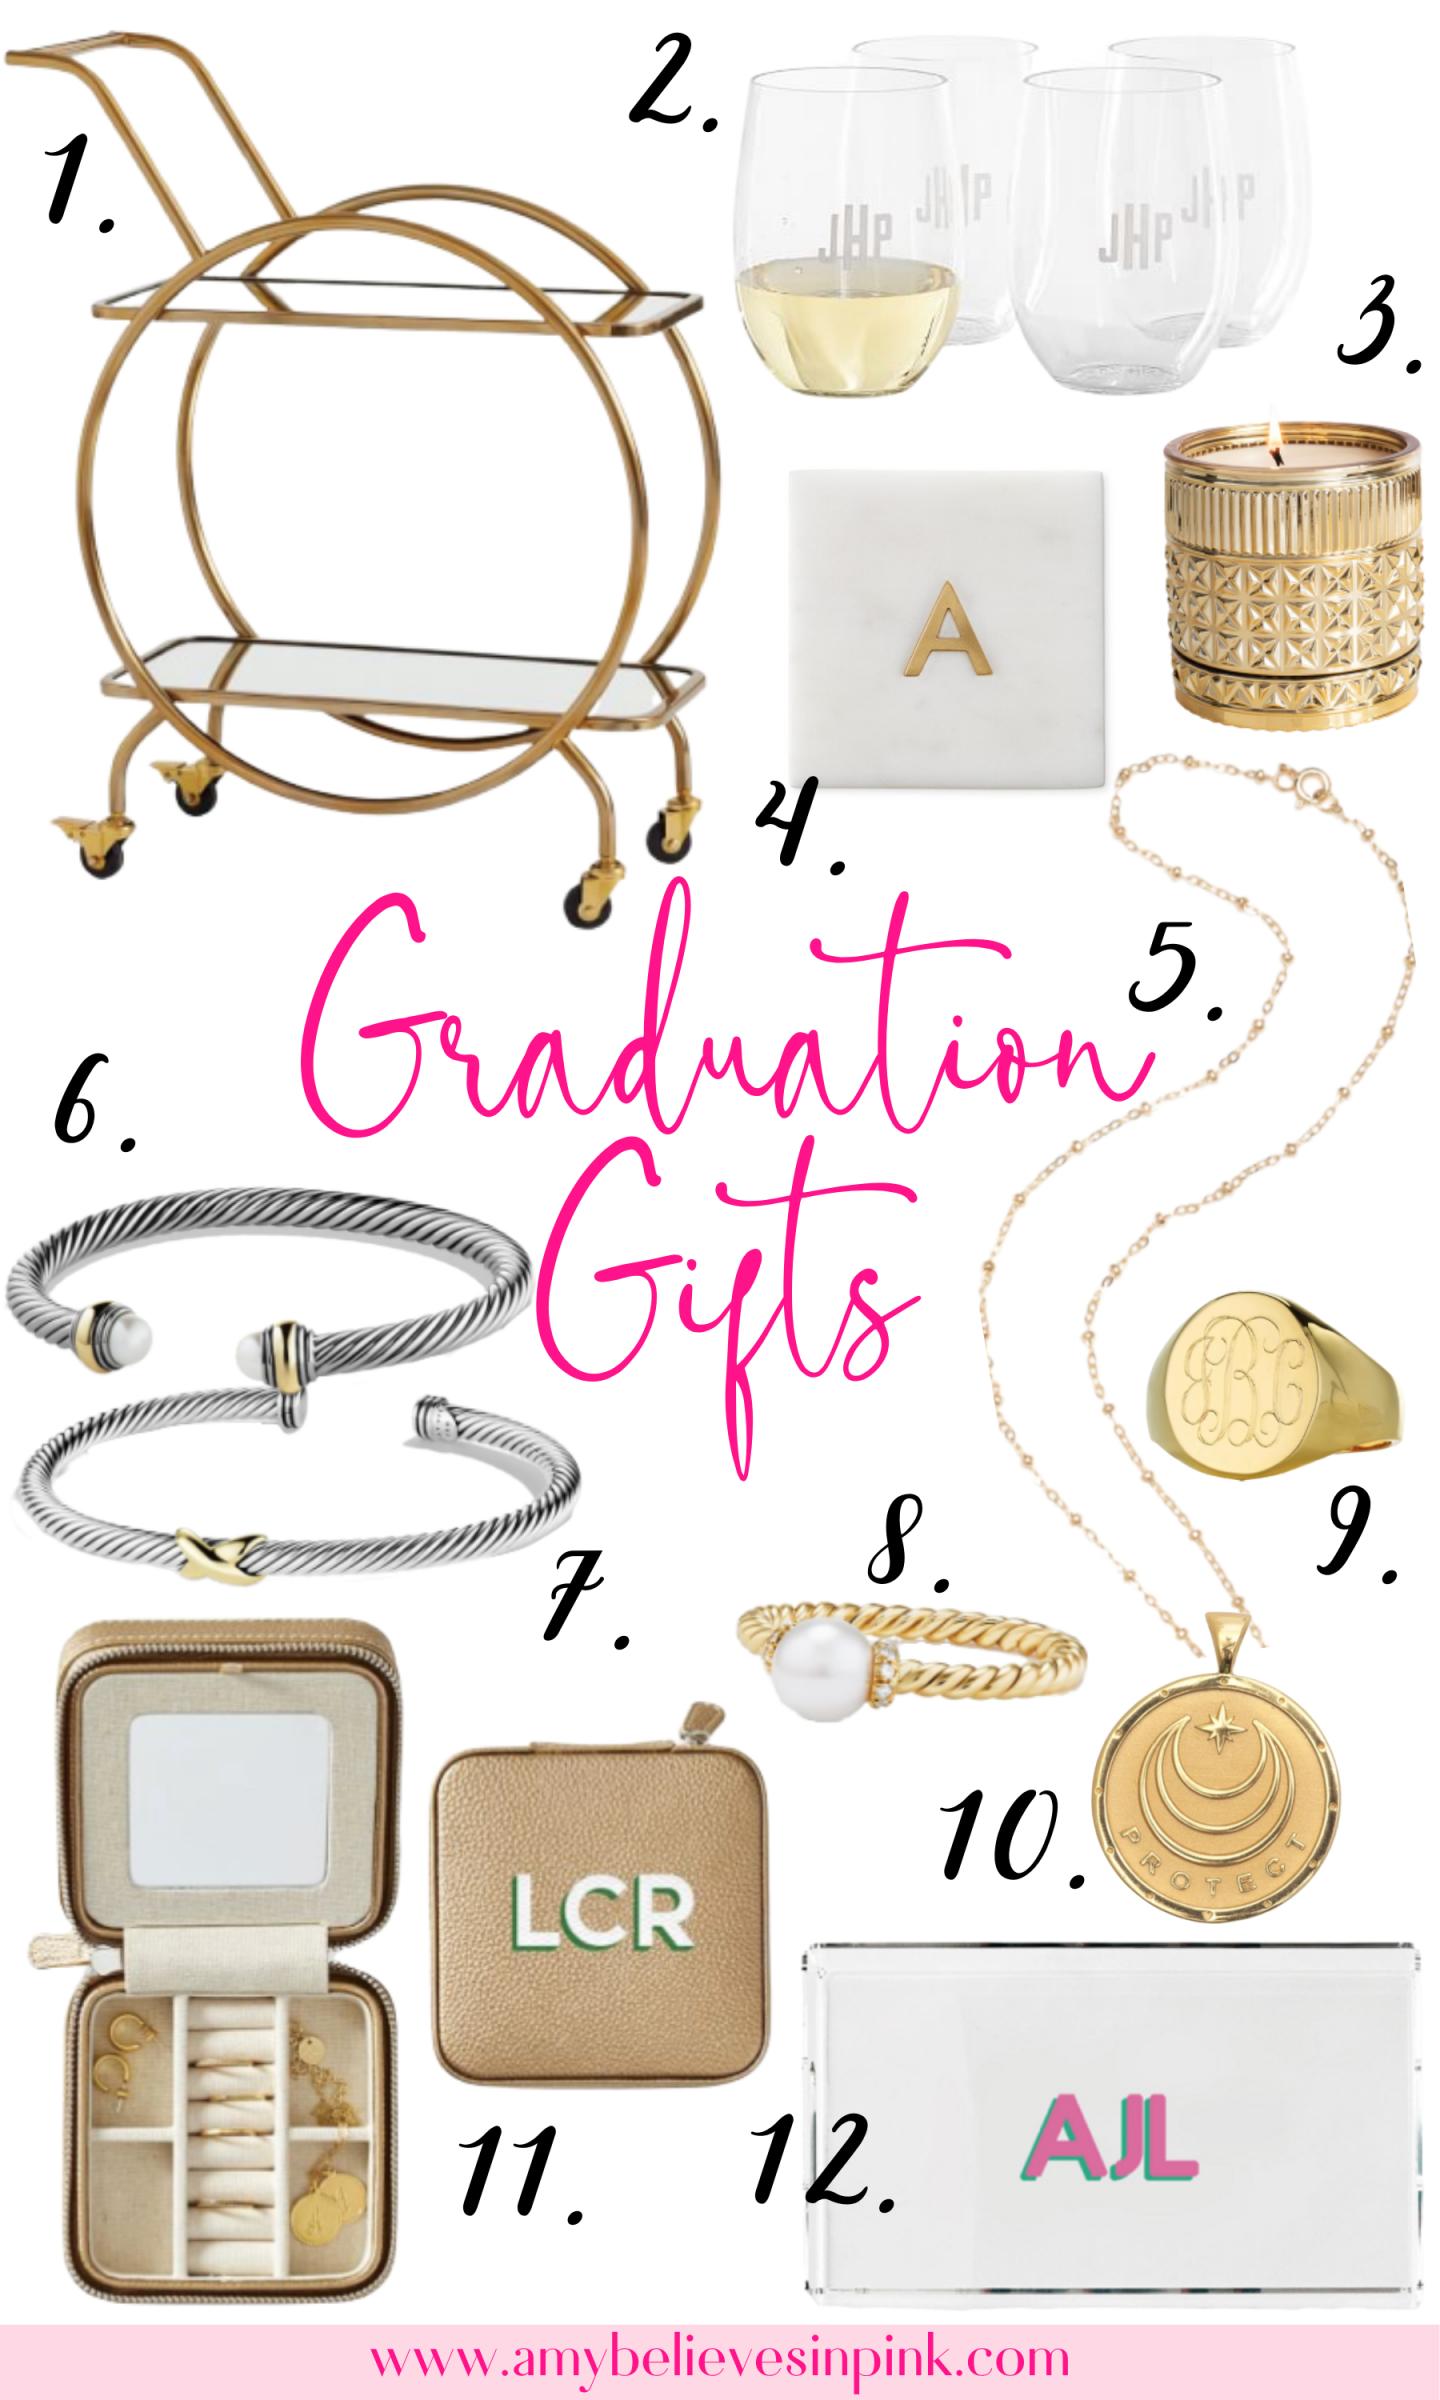 Graduation gift ideas for girls